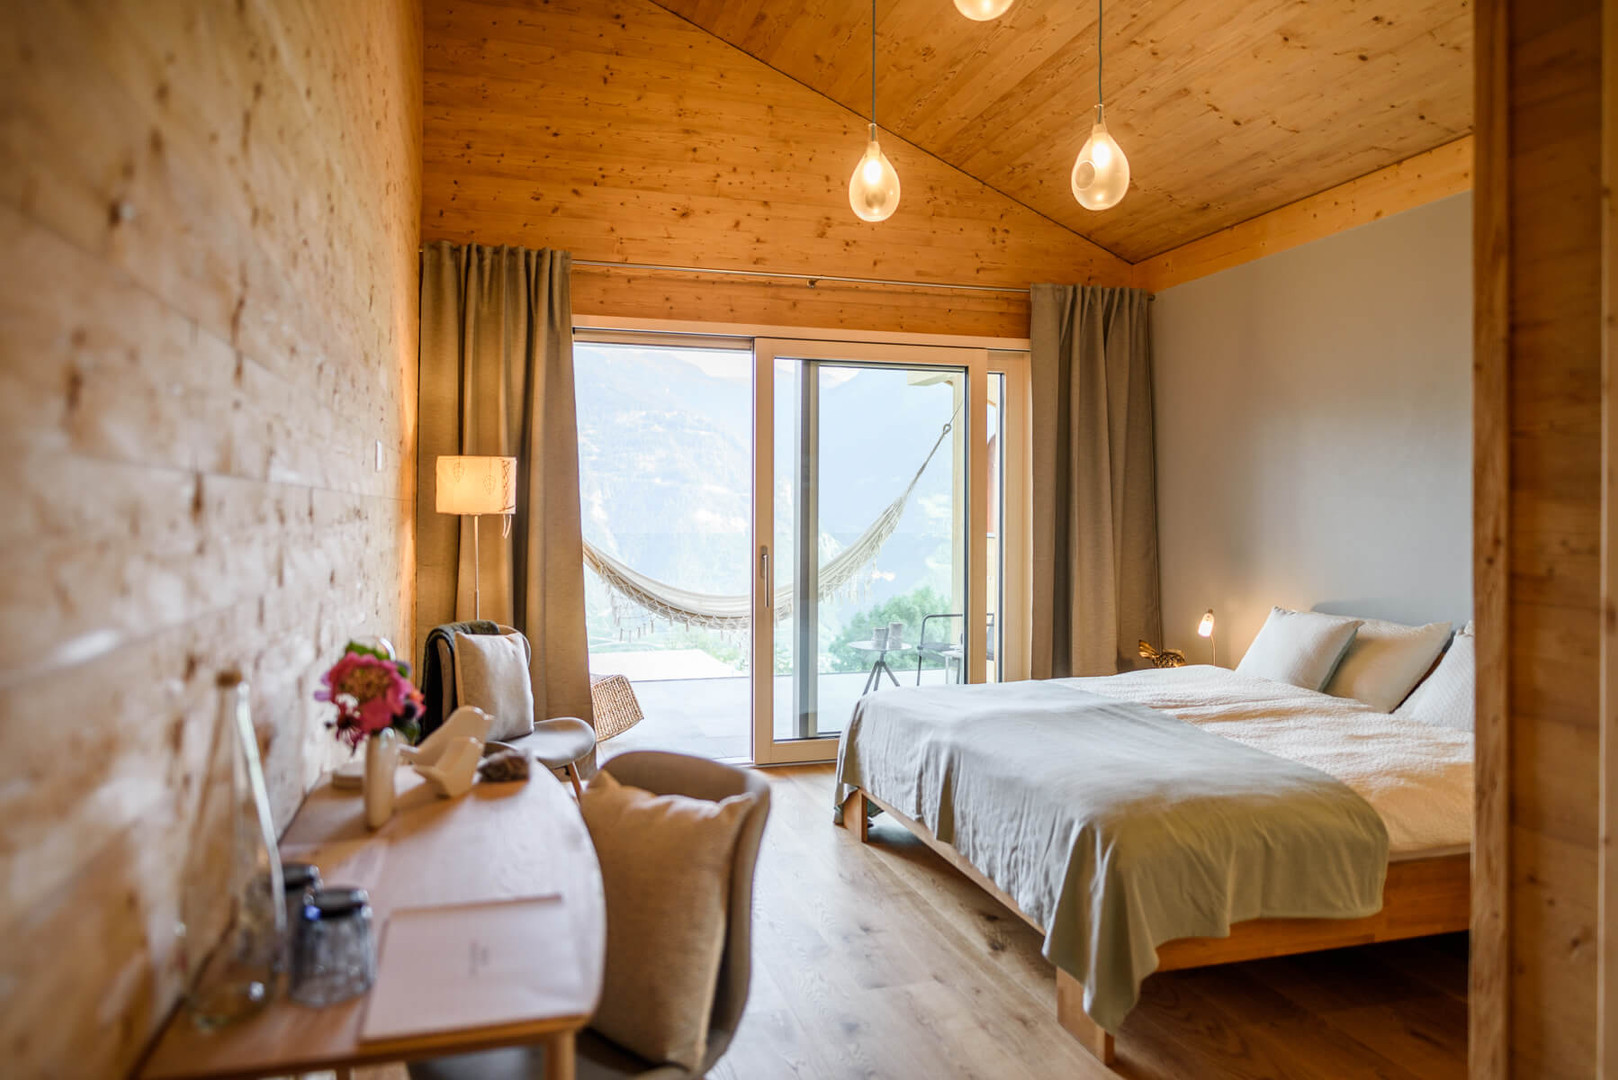 Marketing-guesthouse-suisse-romande.jpg